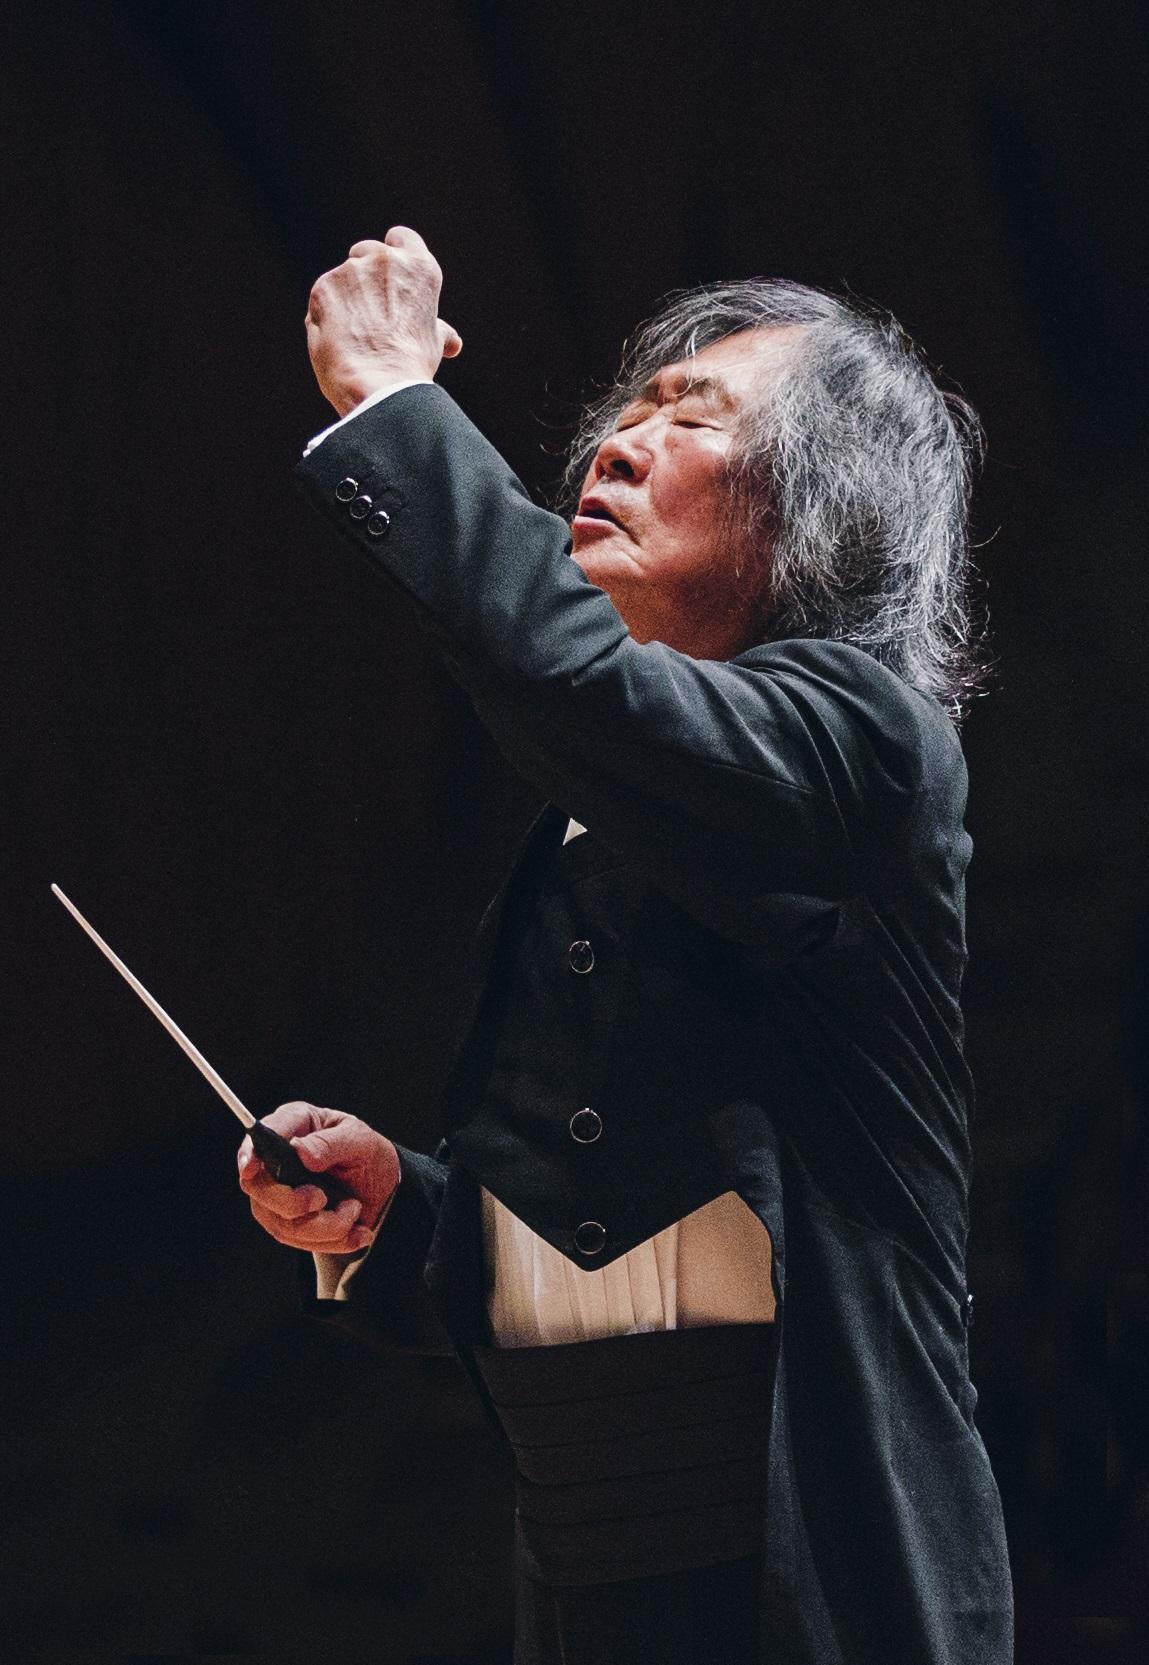 小林 研一郎(Ken-ichiro Kobayashi)